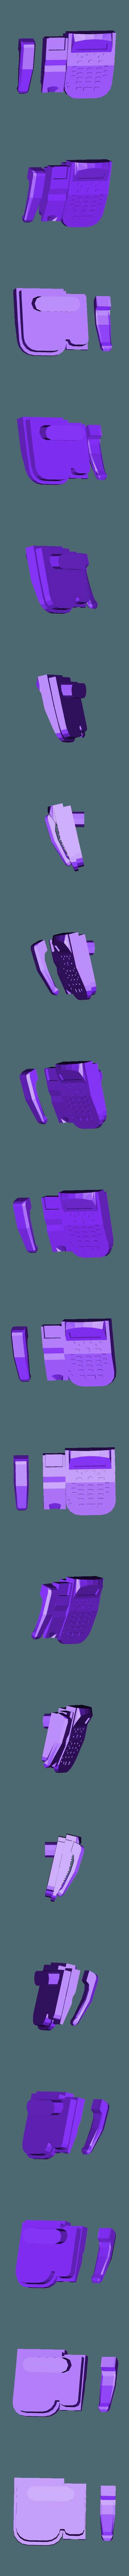 telephone de bureau.stl Download free STL file Telephone +ps4 • 3D printer design, RCGANG93